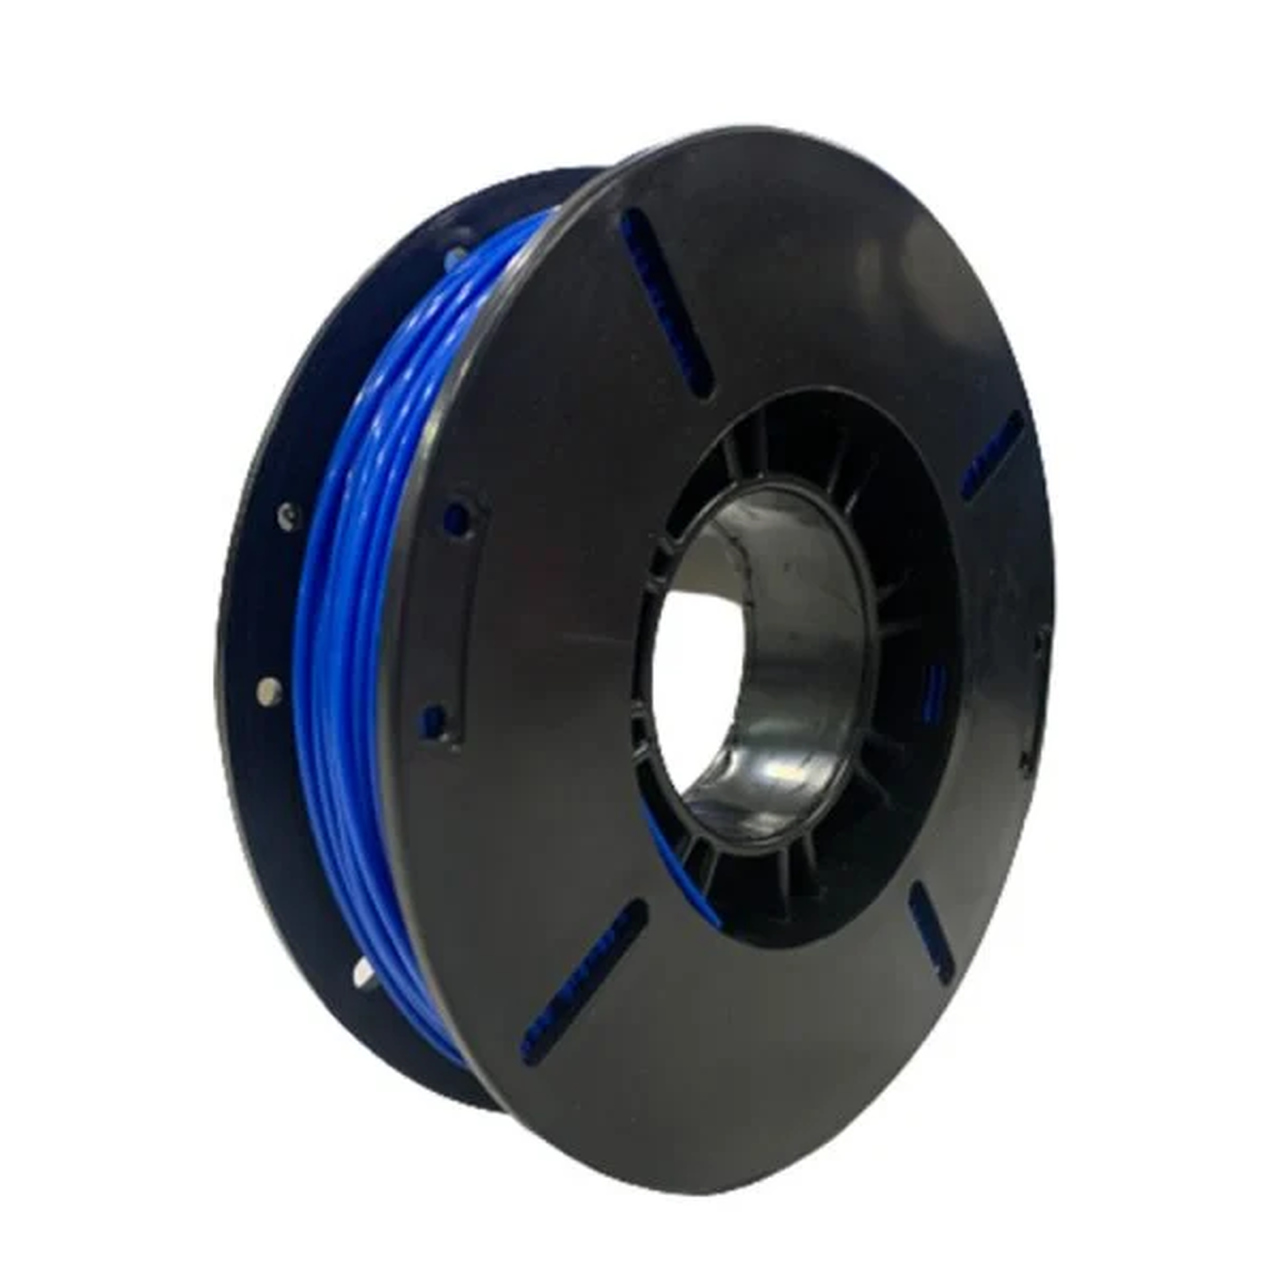 Filamento ABS Premium - Azul - 3D Lab - 1.75mm - 200g